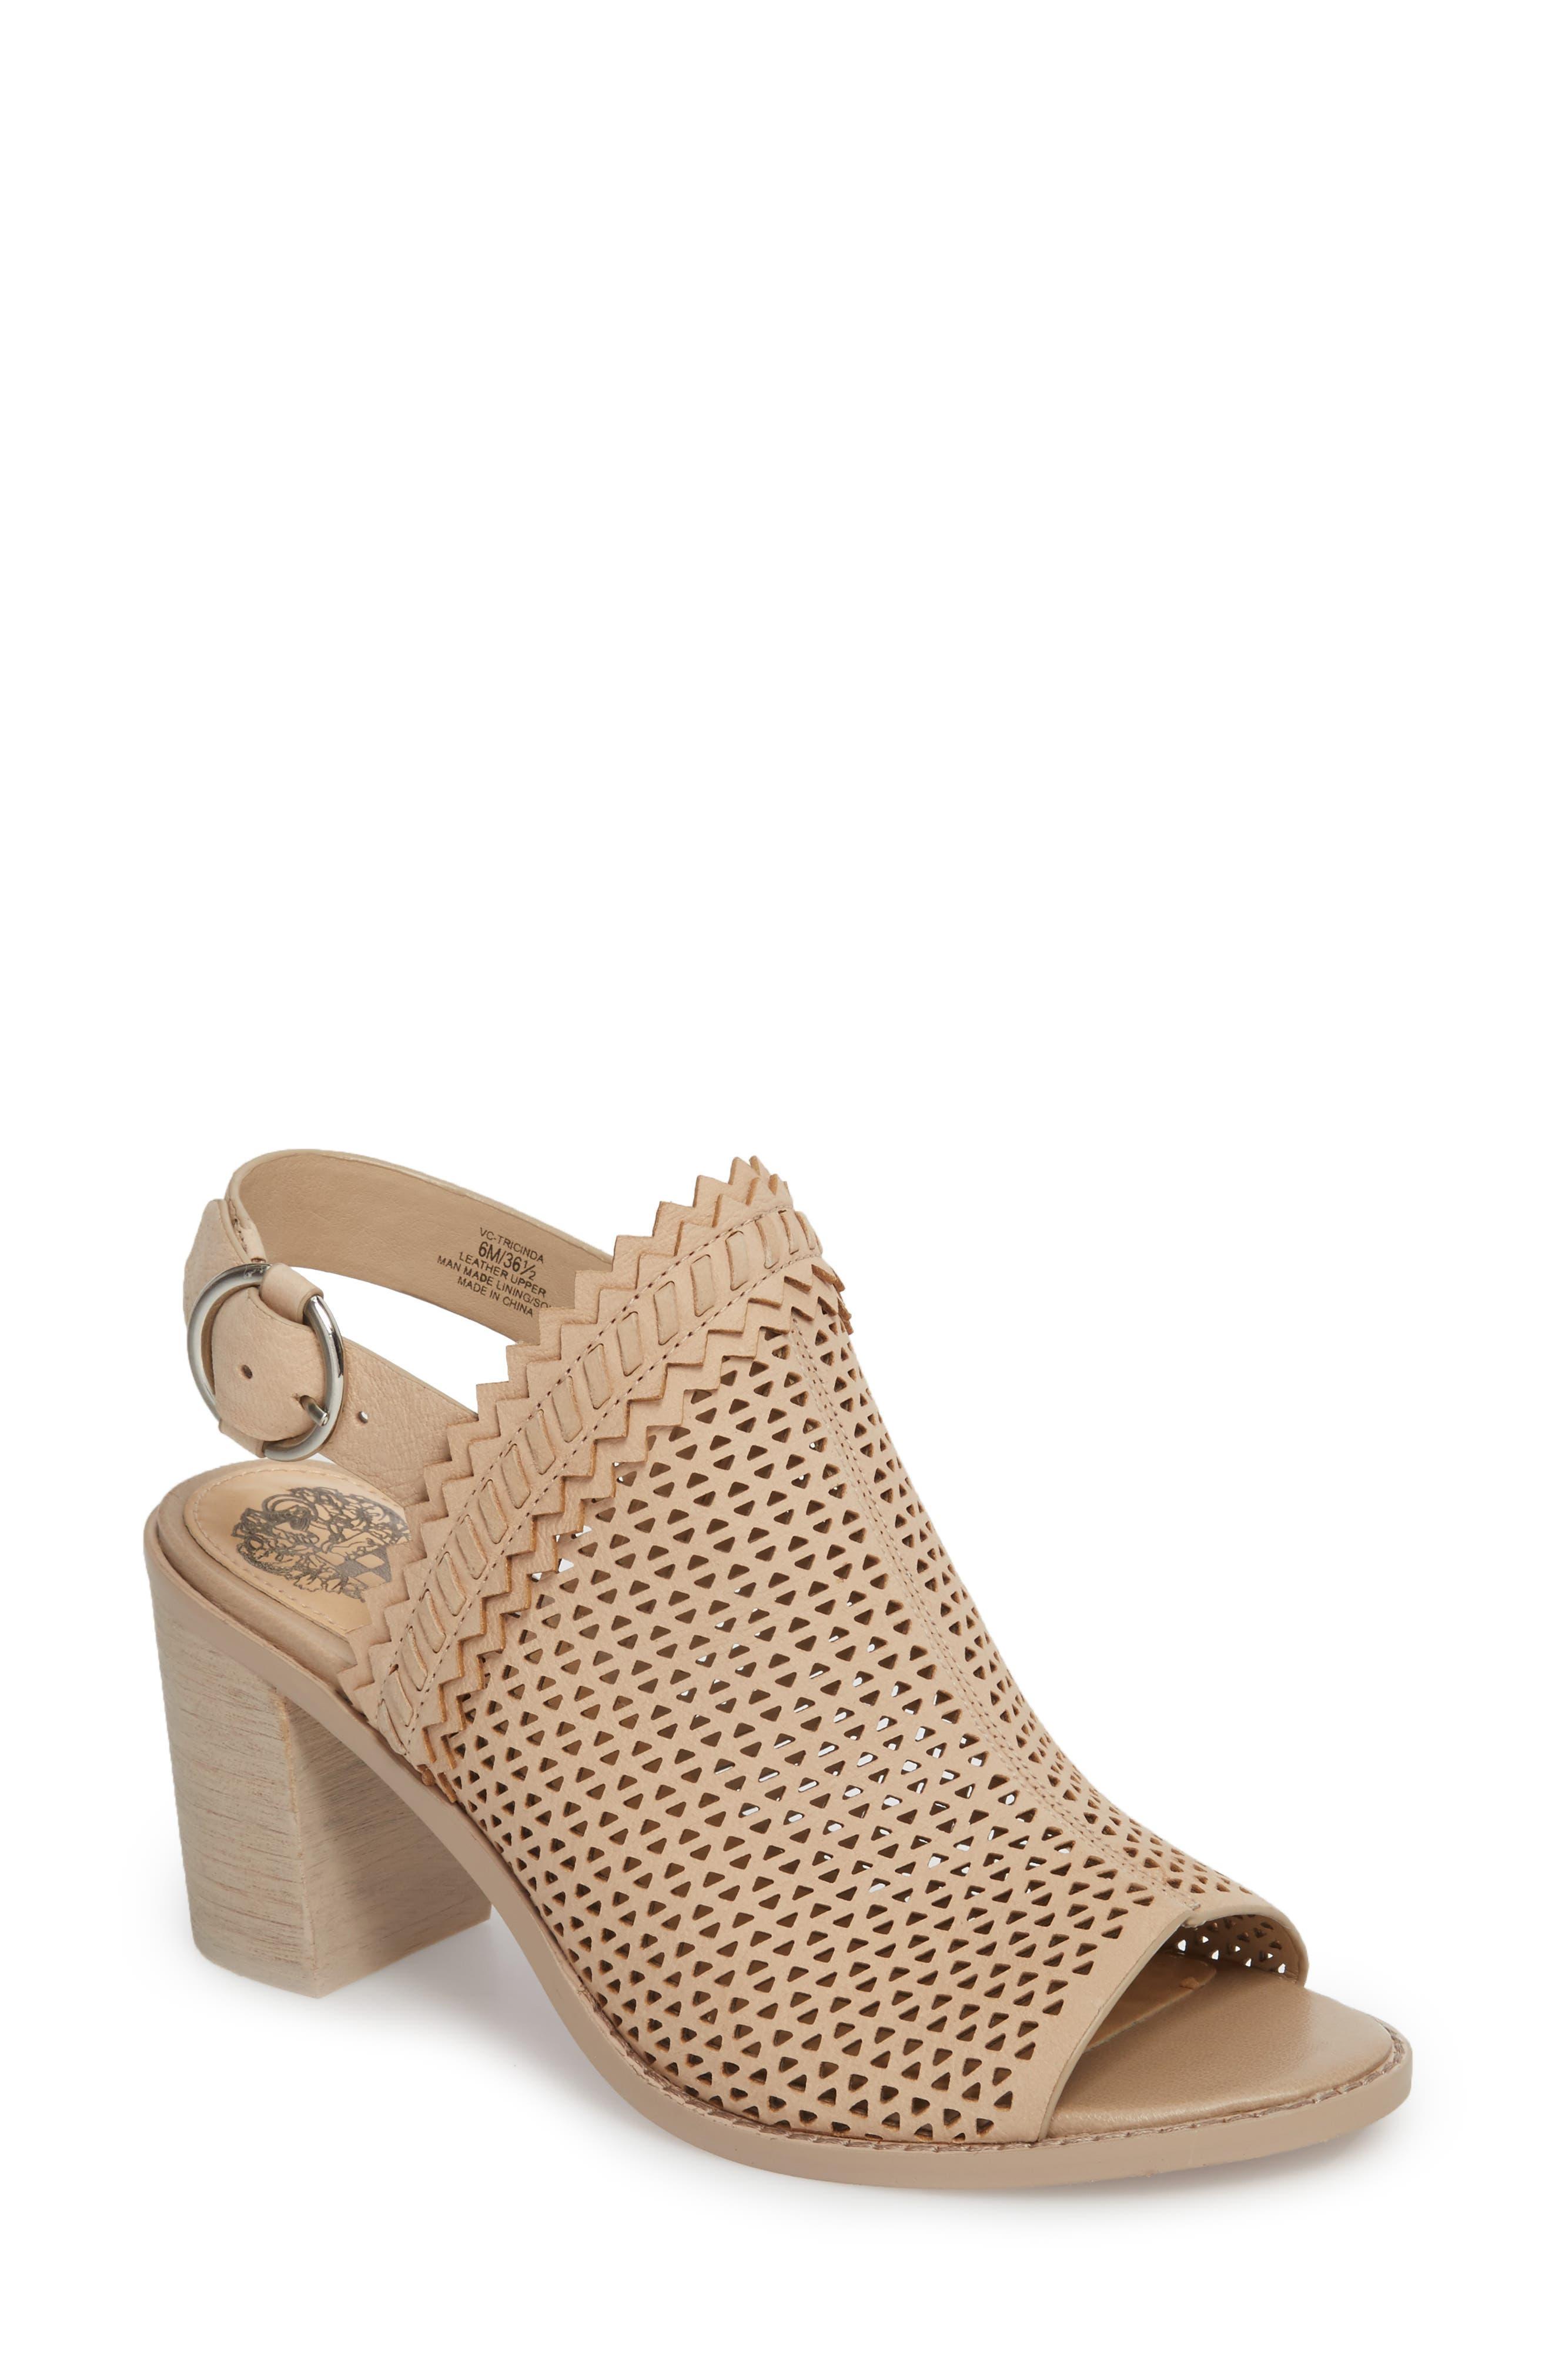 Tricinda Block Heel Sandal,                         Main,                         color, SHELL LEATHER